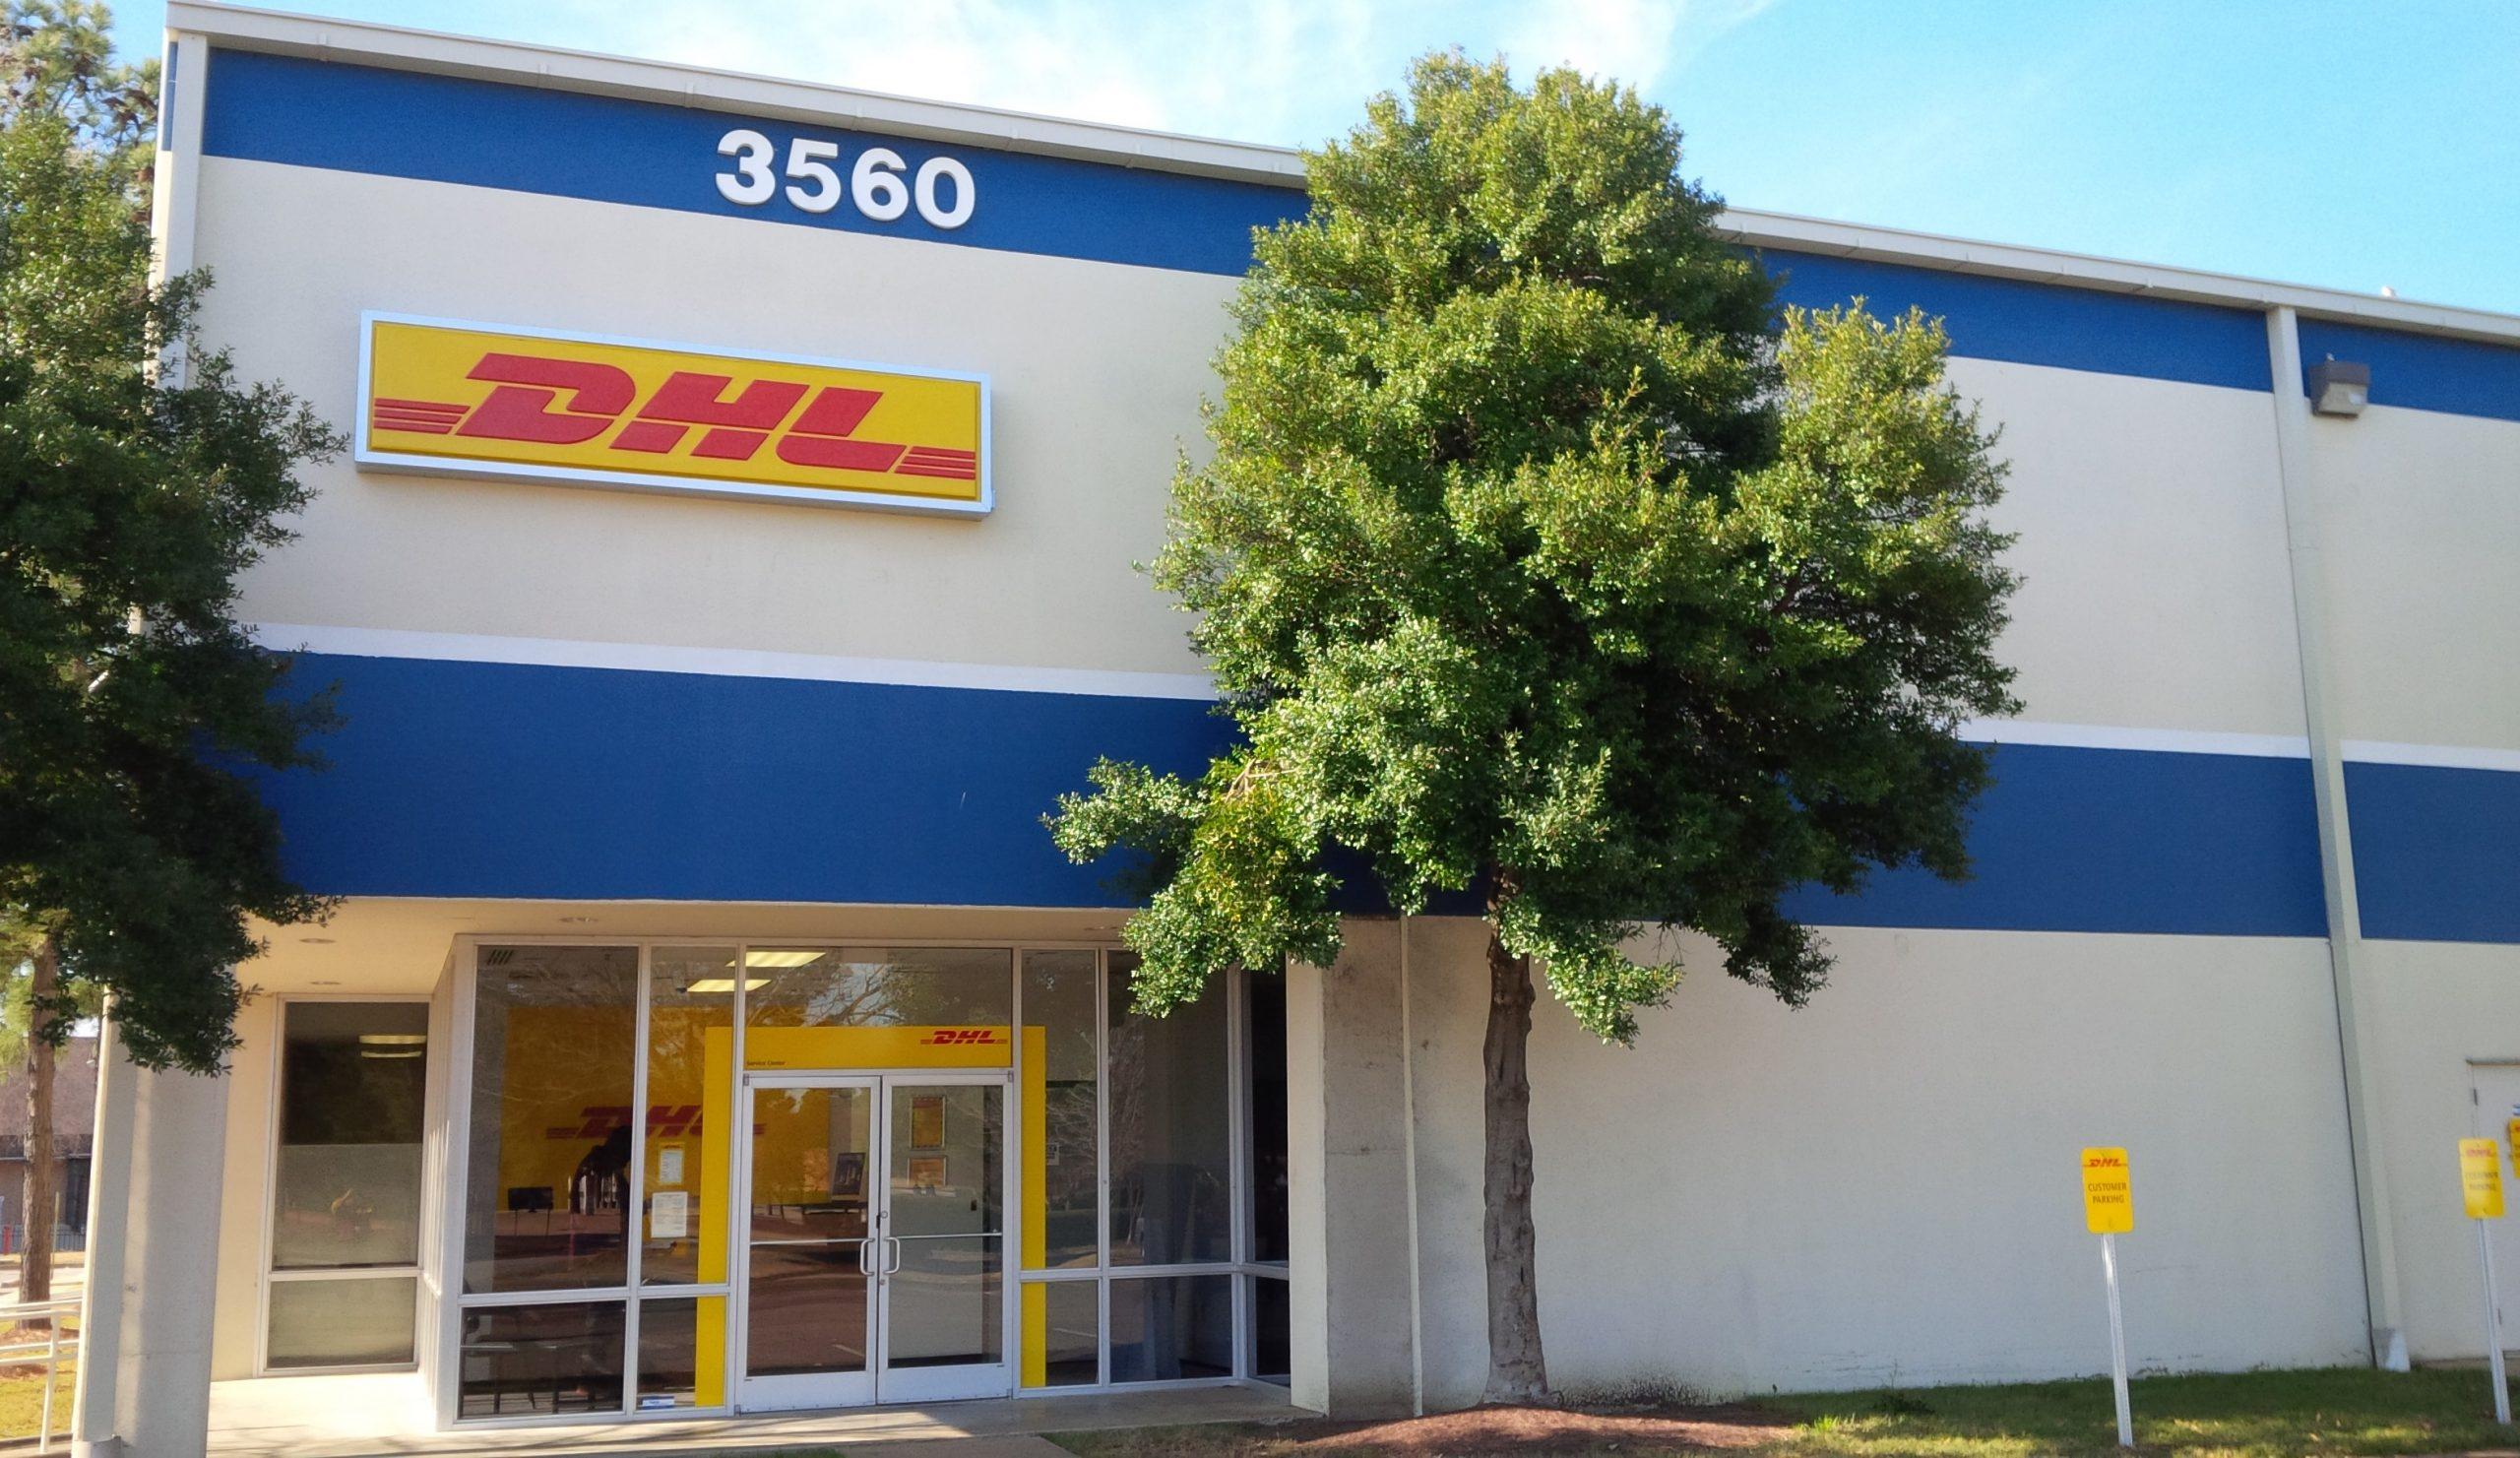 DHL unveils new service centre in Memphis